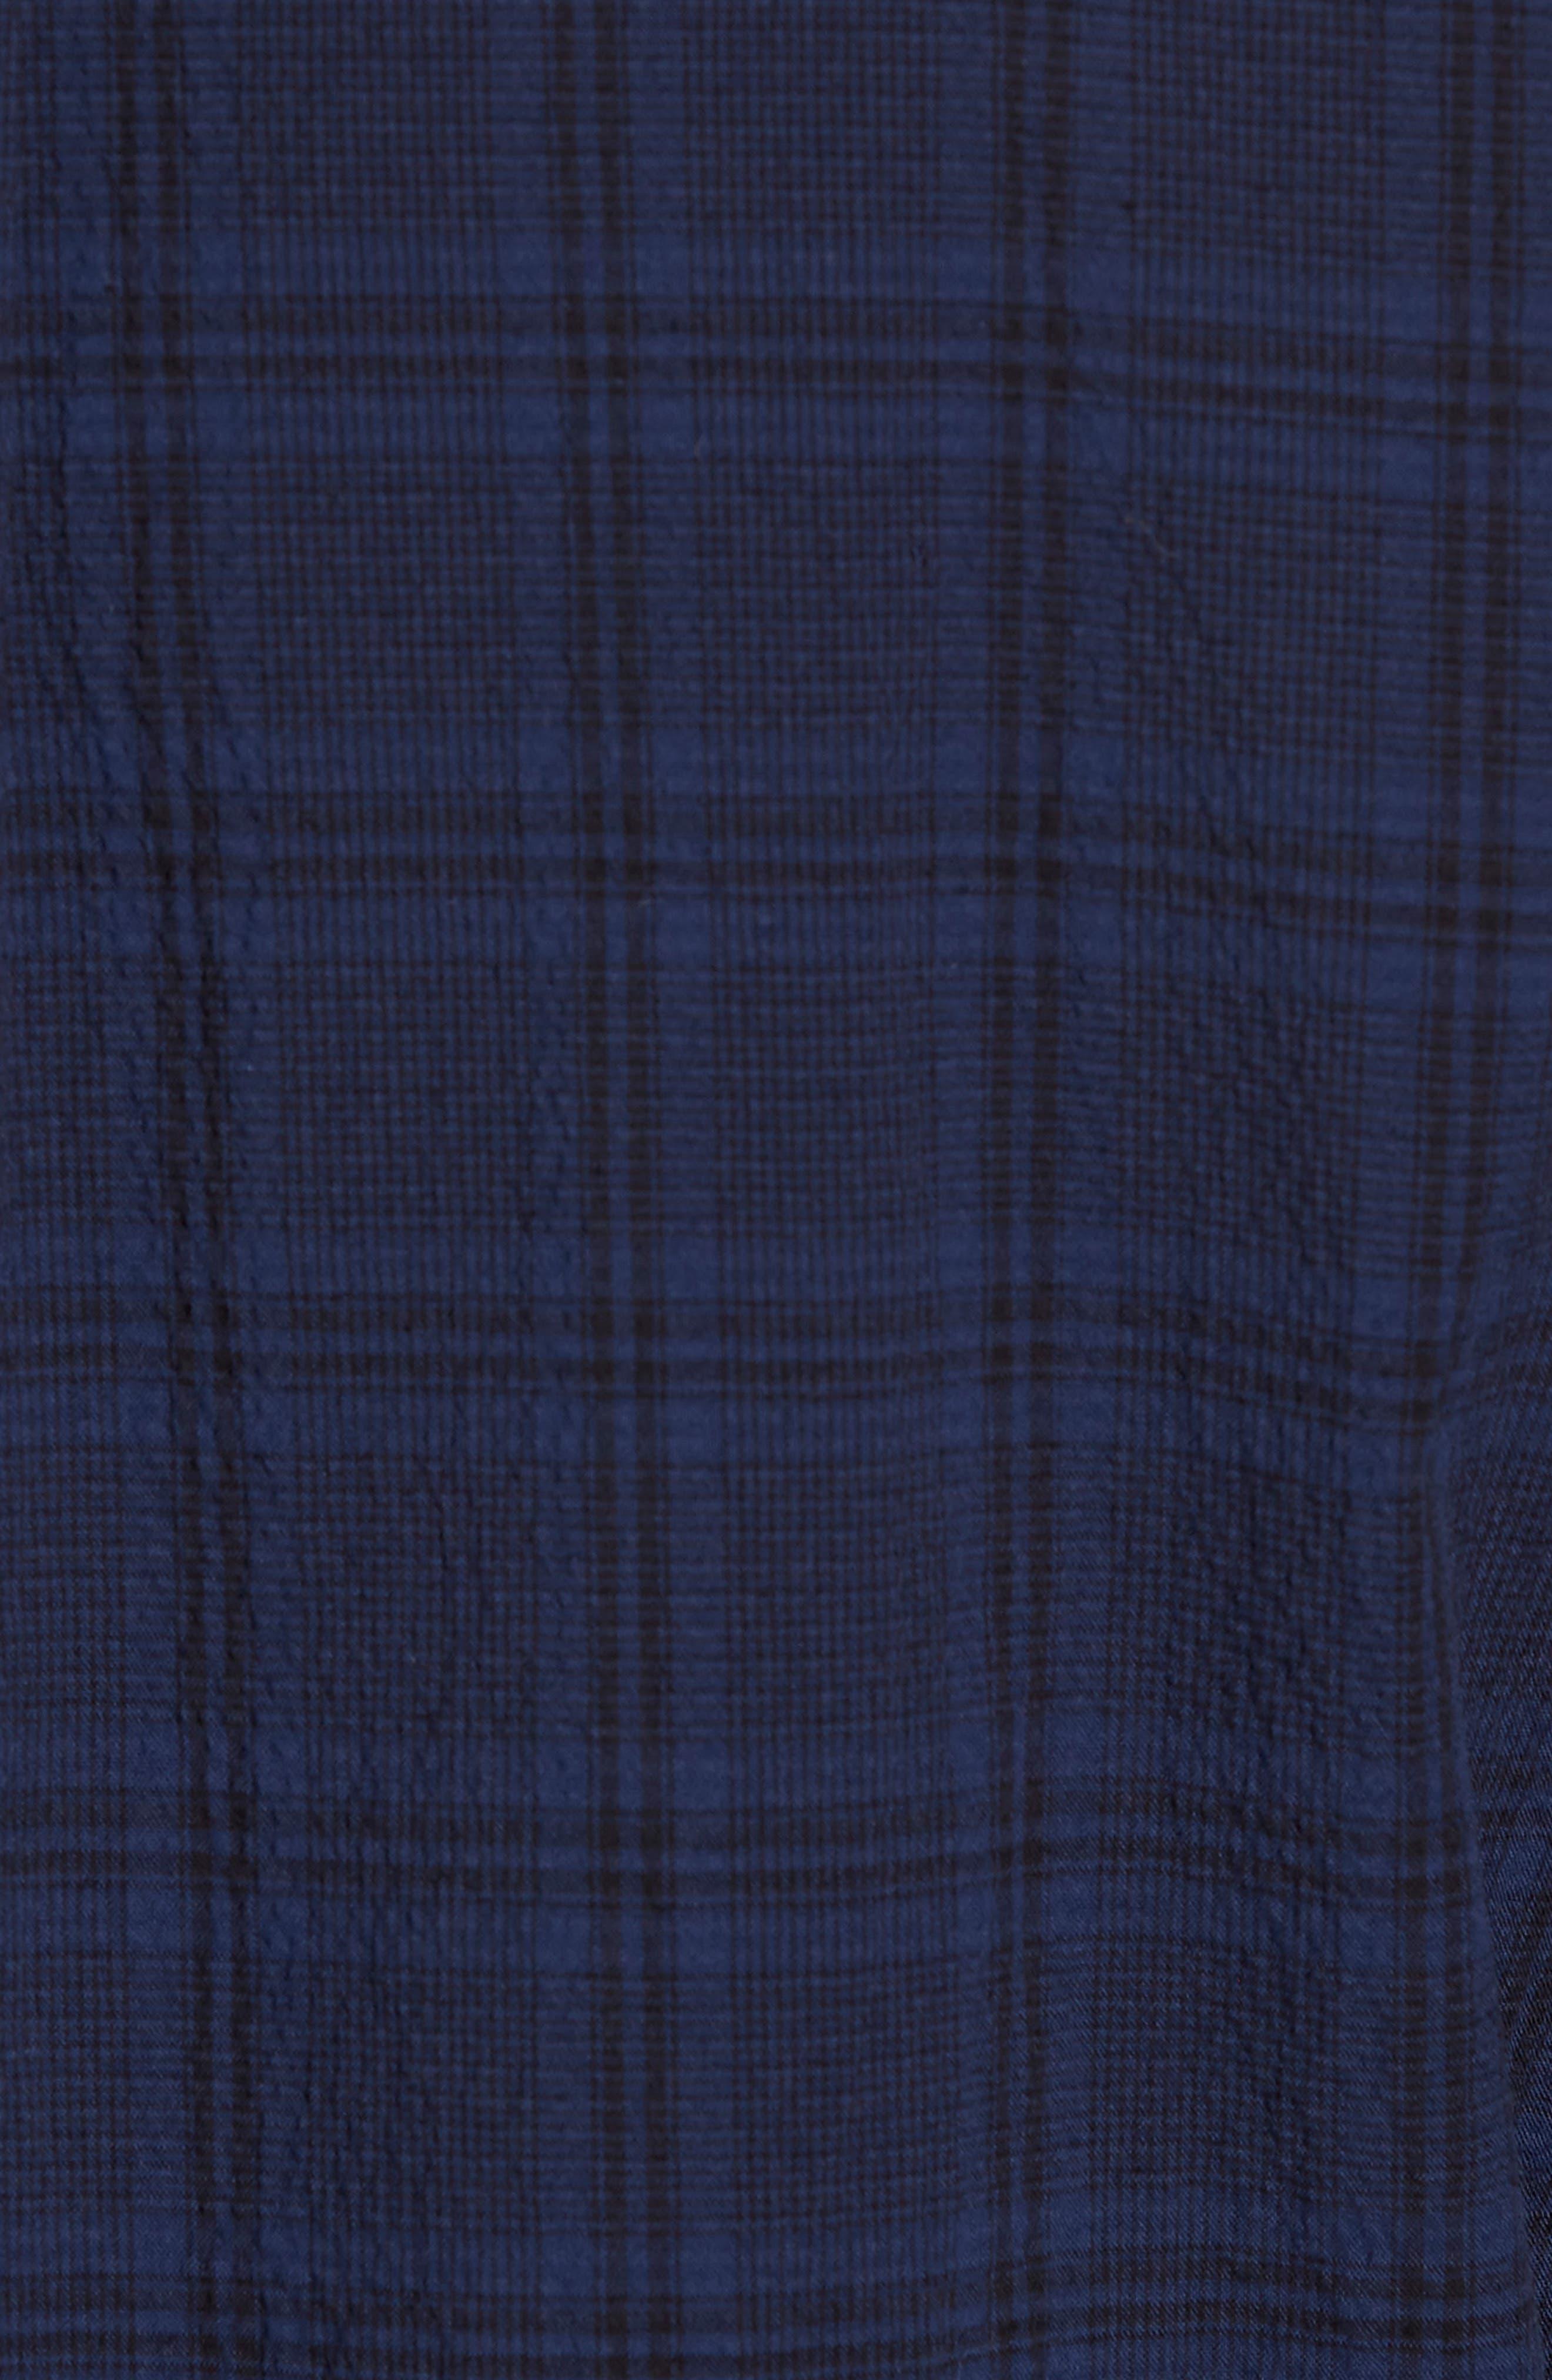 Slim Fit Plaid Stretch Sport Shirt,                             Alternate thumbnail 5, color,                             Navy Seersucker Plaid